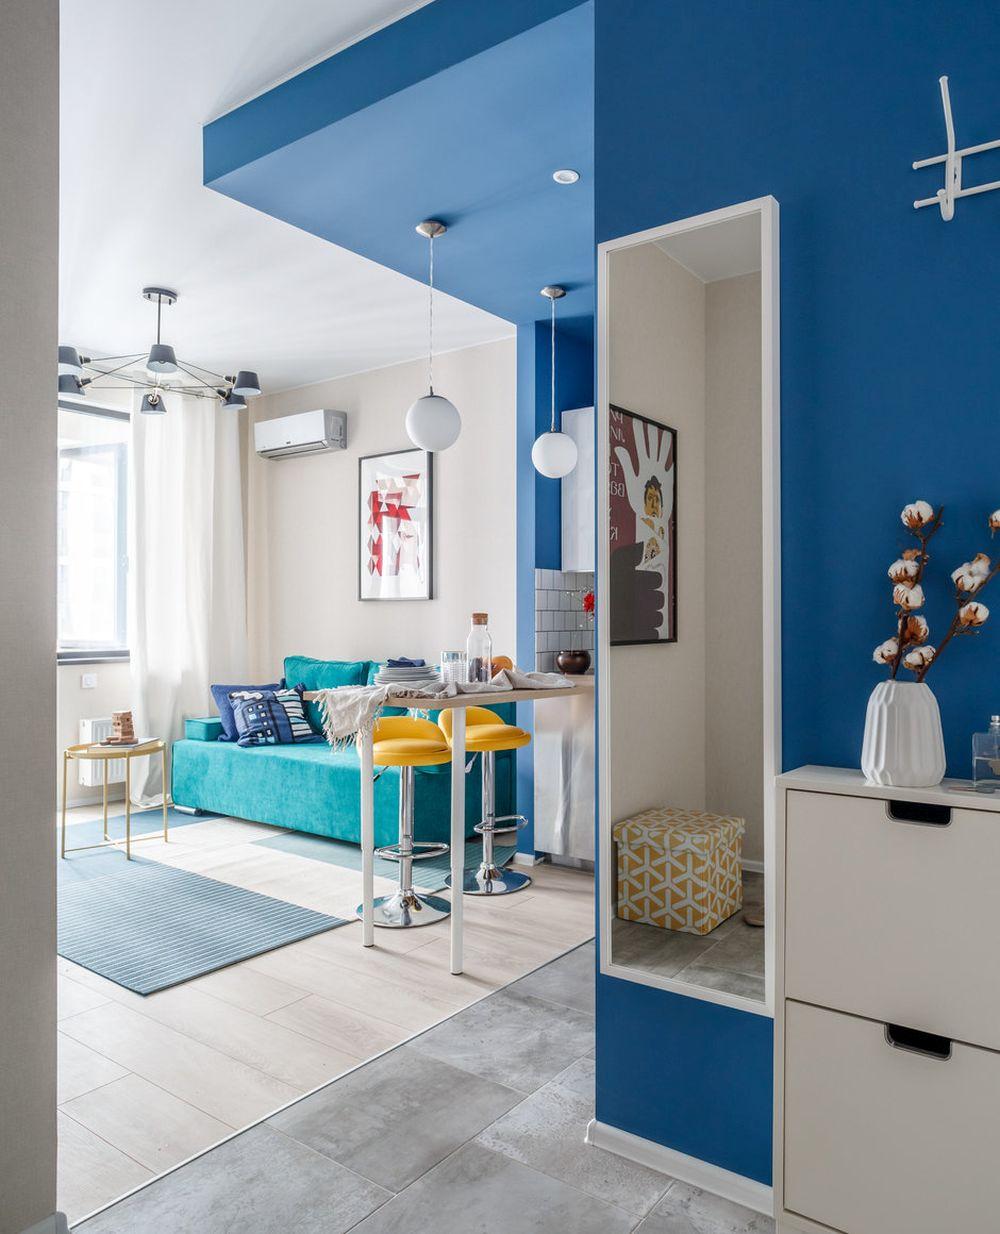 adelaparvu.com despre apartament de 2 camere in 40 mp, design Marina Novikova si Olga Ljubis, Foto Mikhail Loskutov (5)